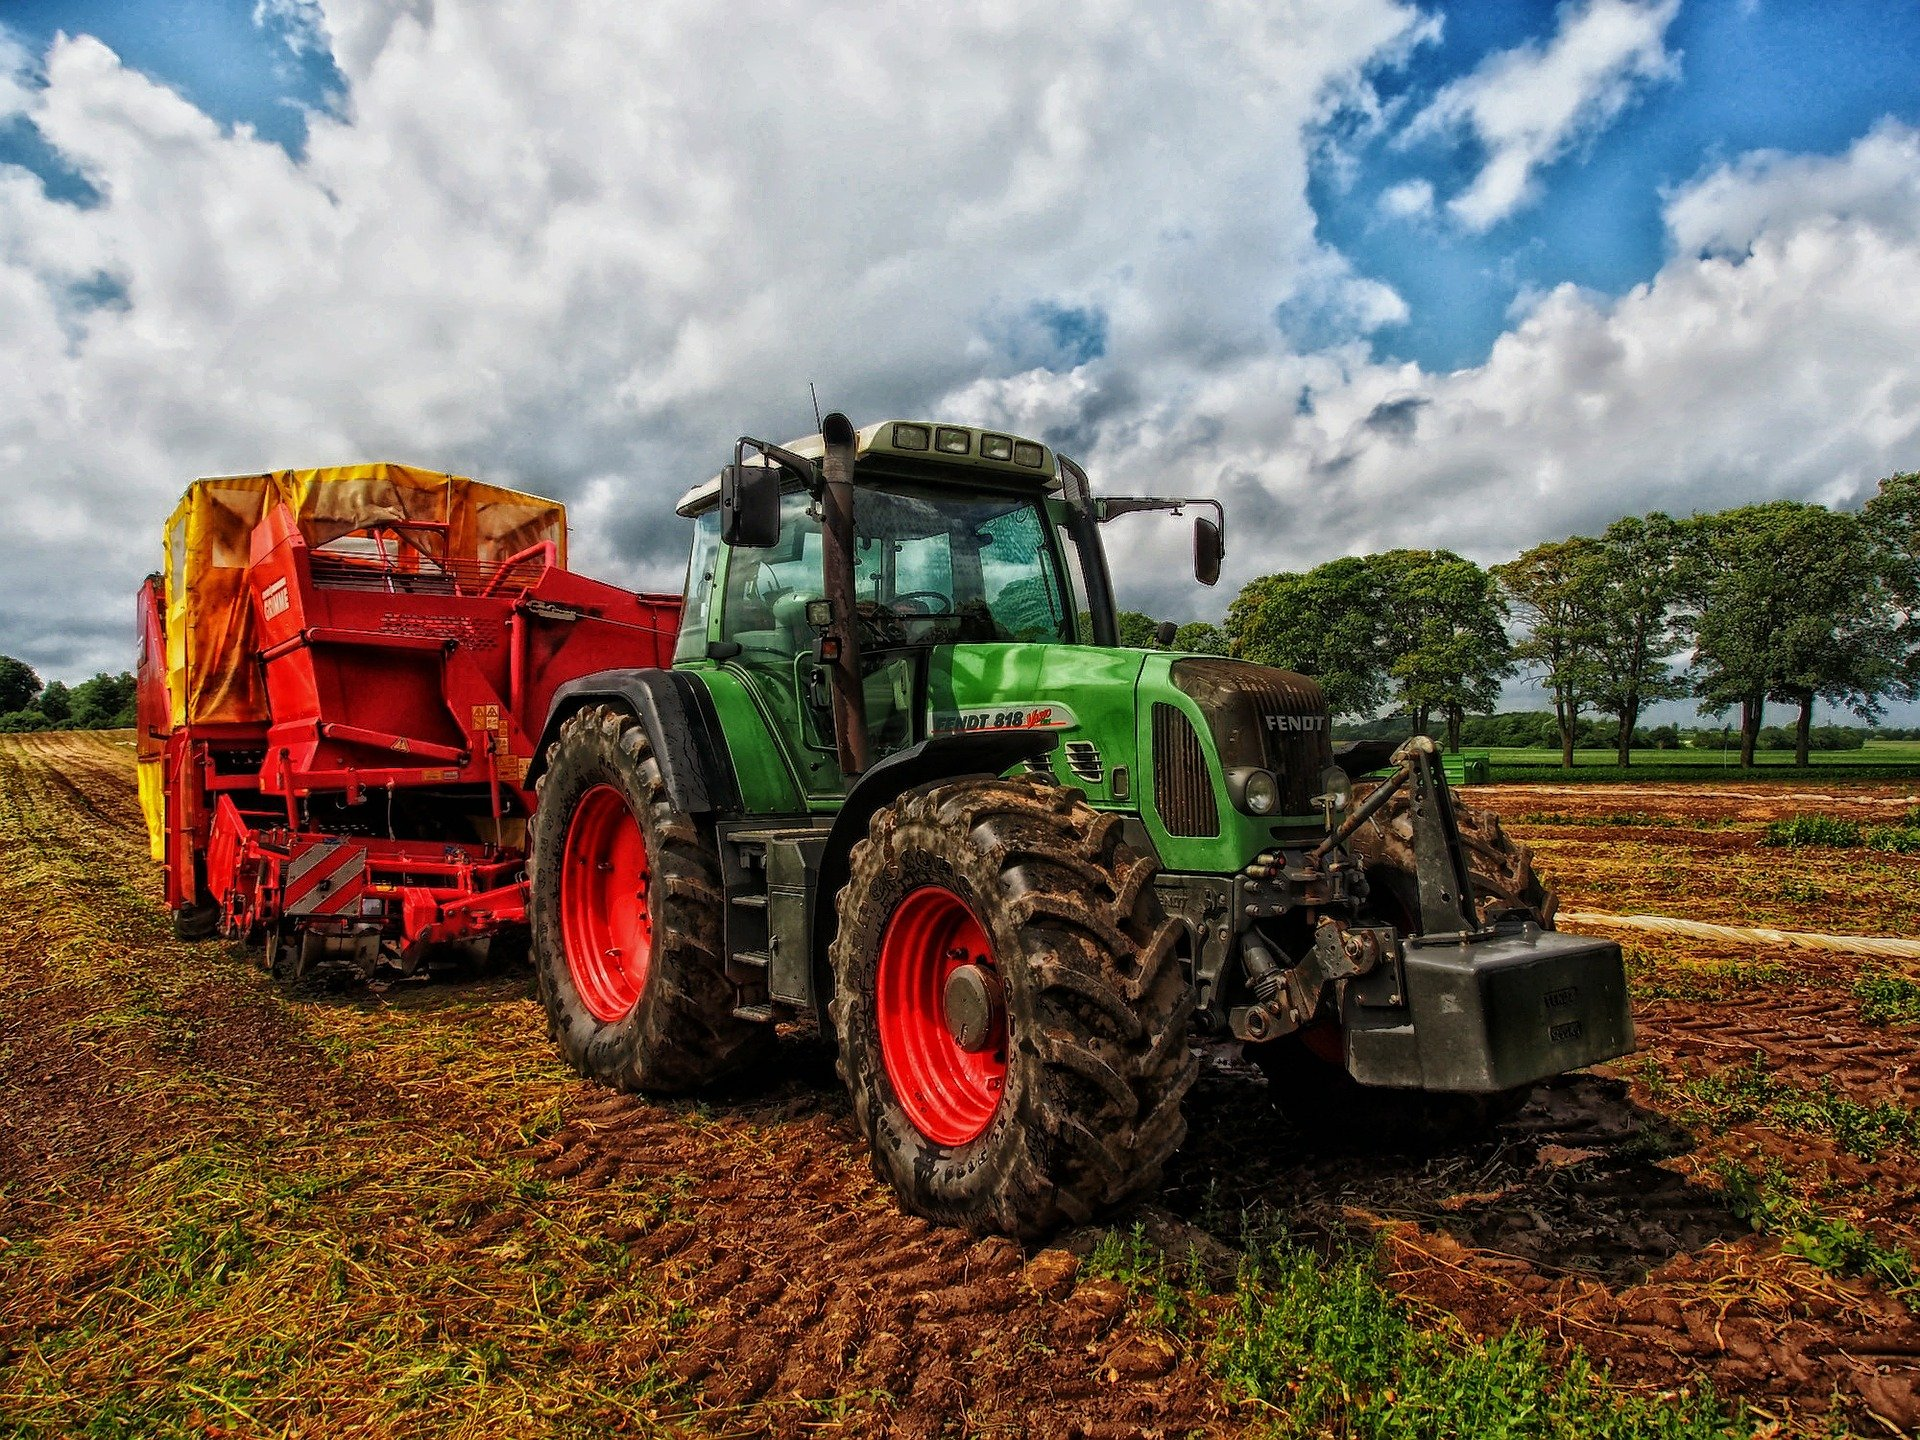 traktor, mark, landbrug, udenfor